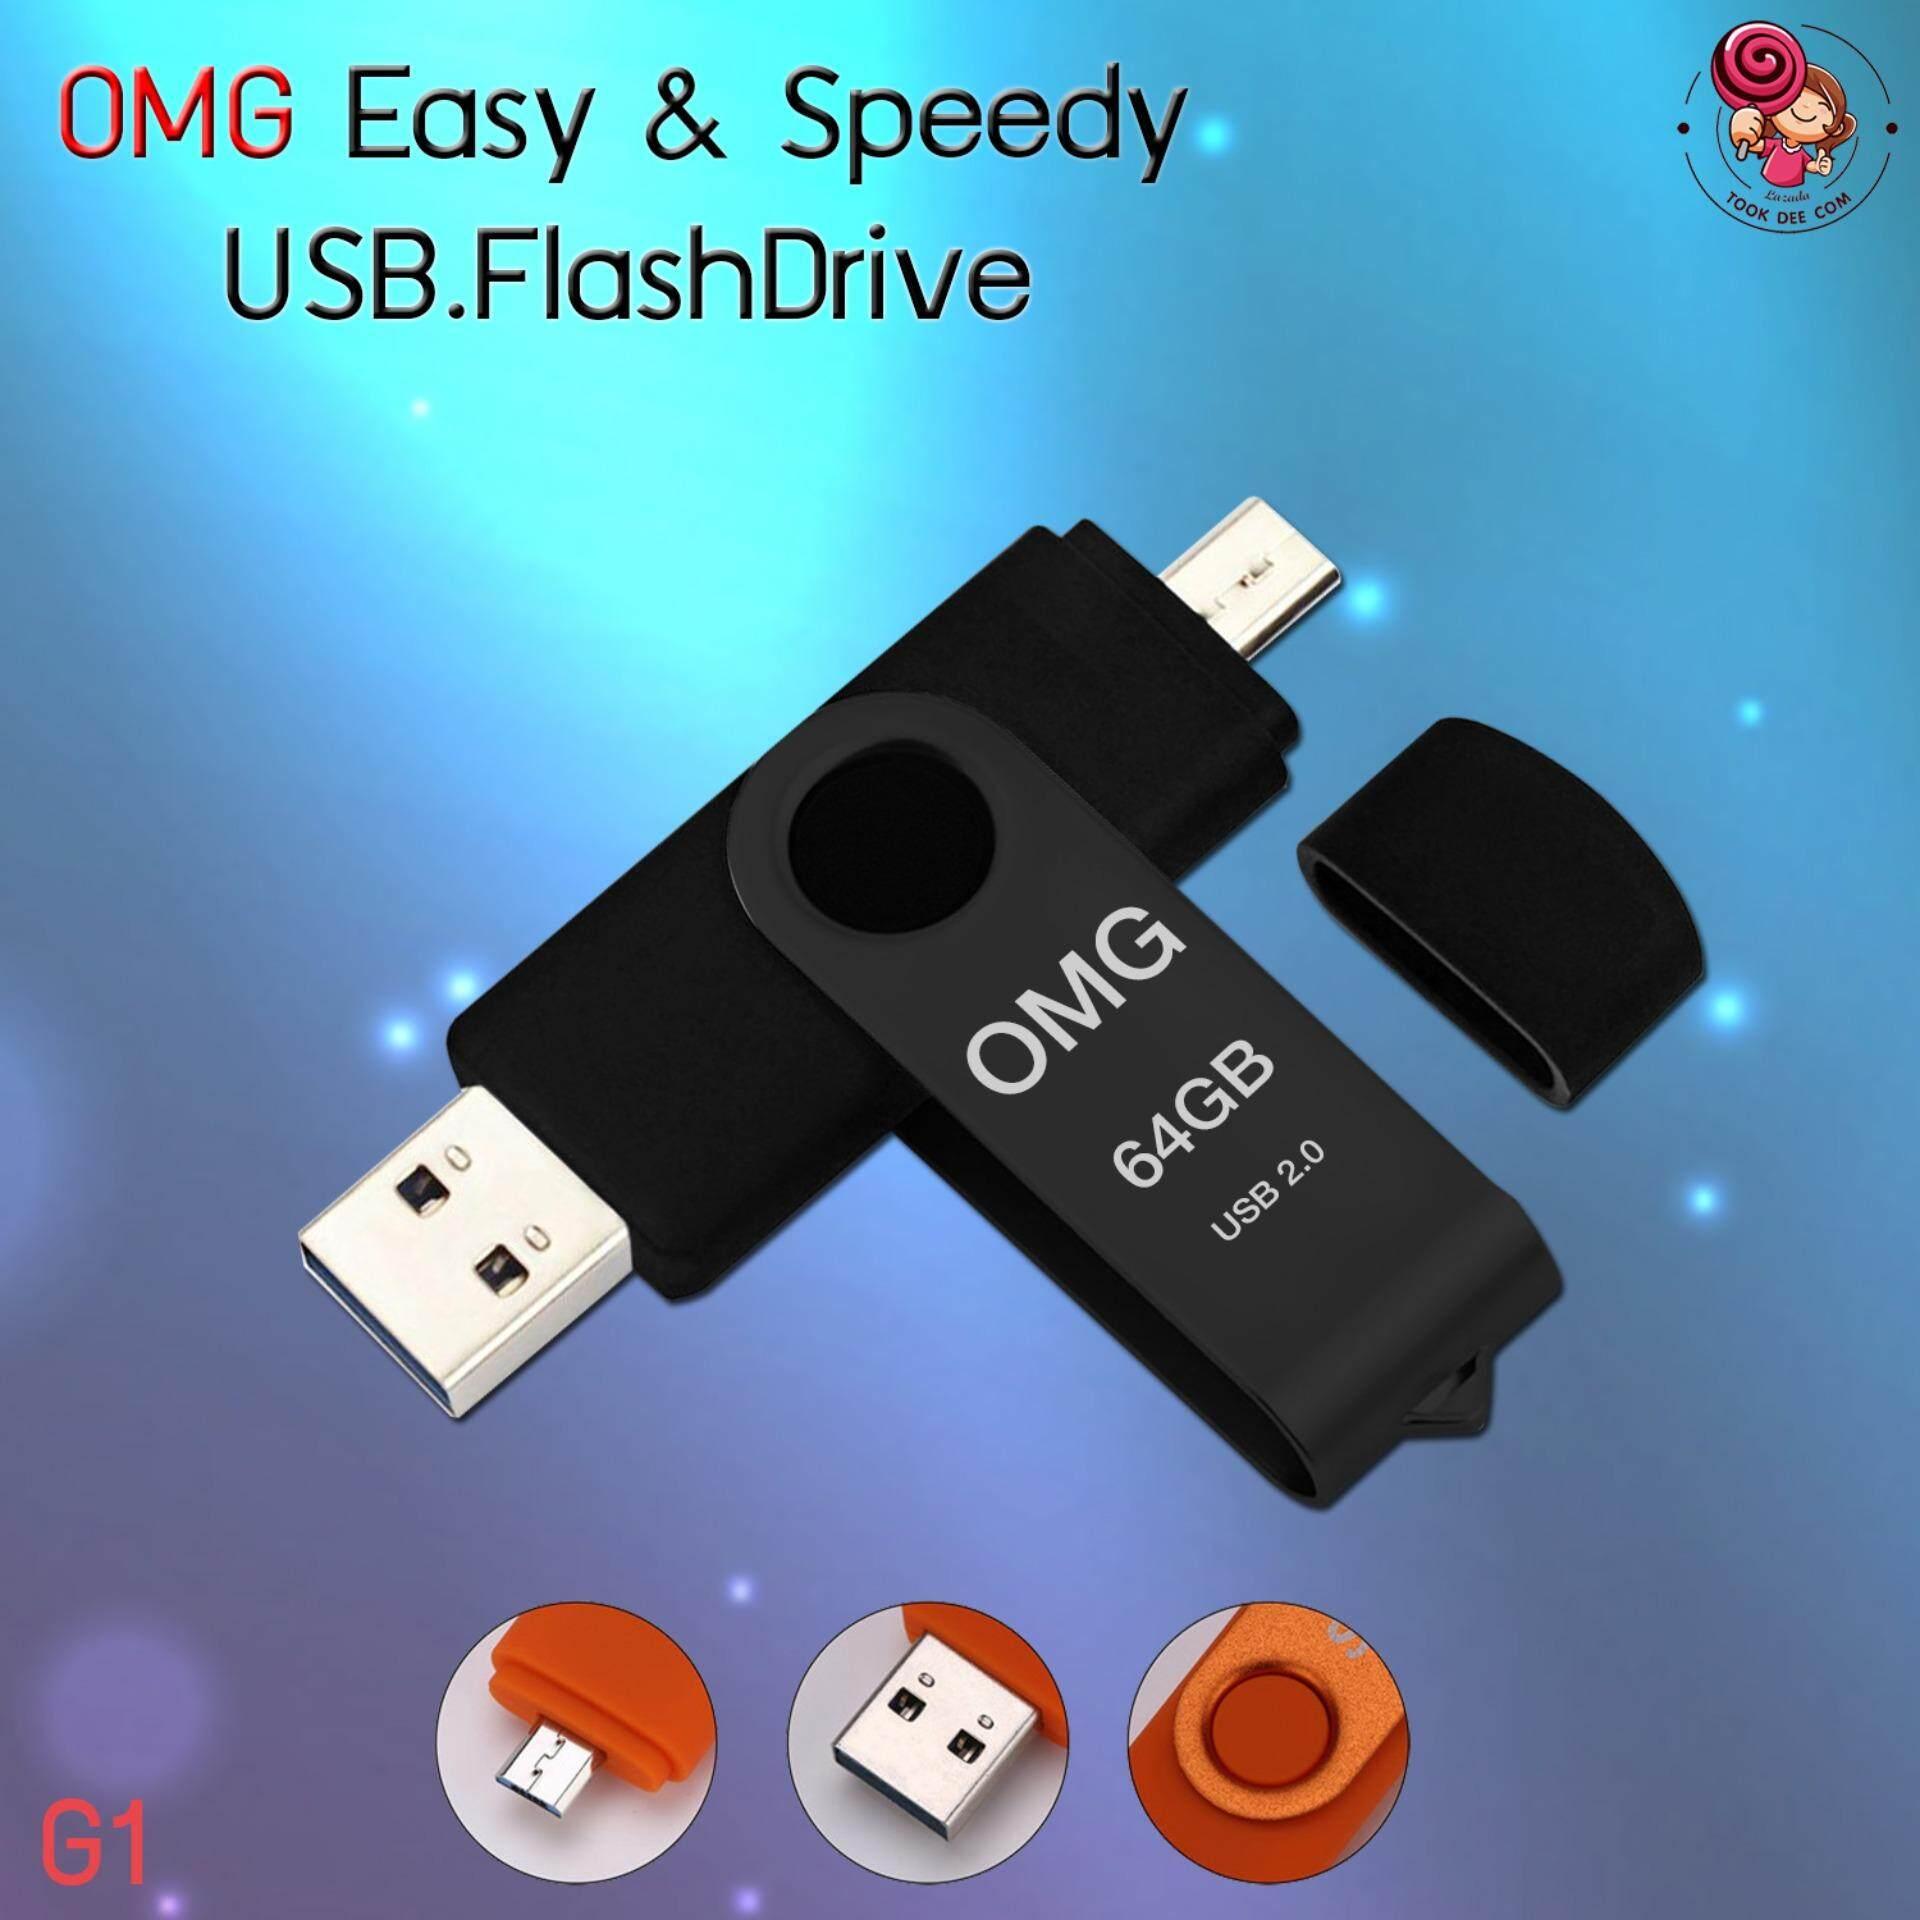 Omg Hyh-G1 Otg Usb.flashdrive 64/128/256/1tb/2tb.gb แฟลชไดร์ฟ Highspeed Usb2.0.